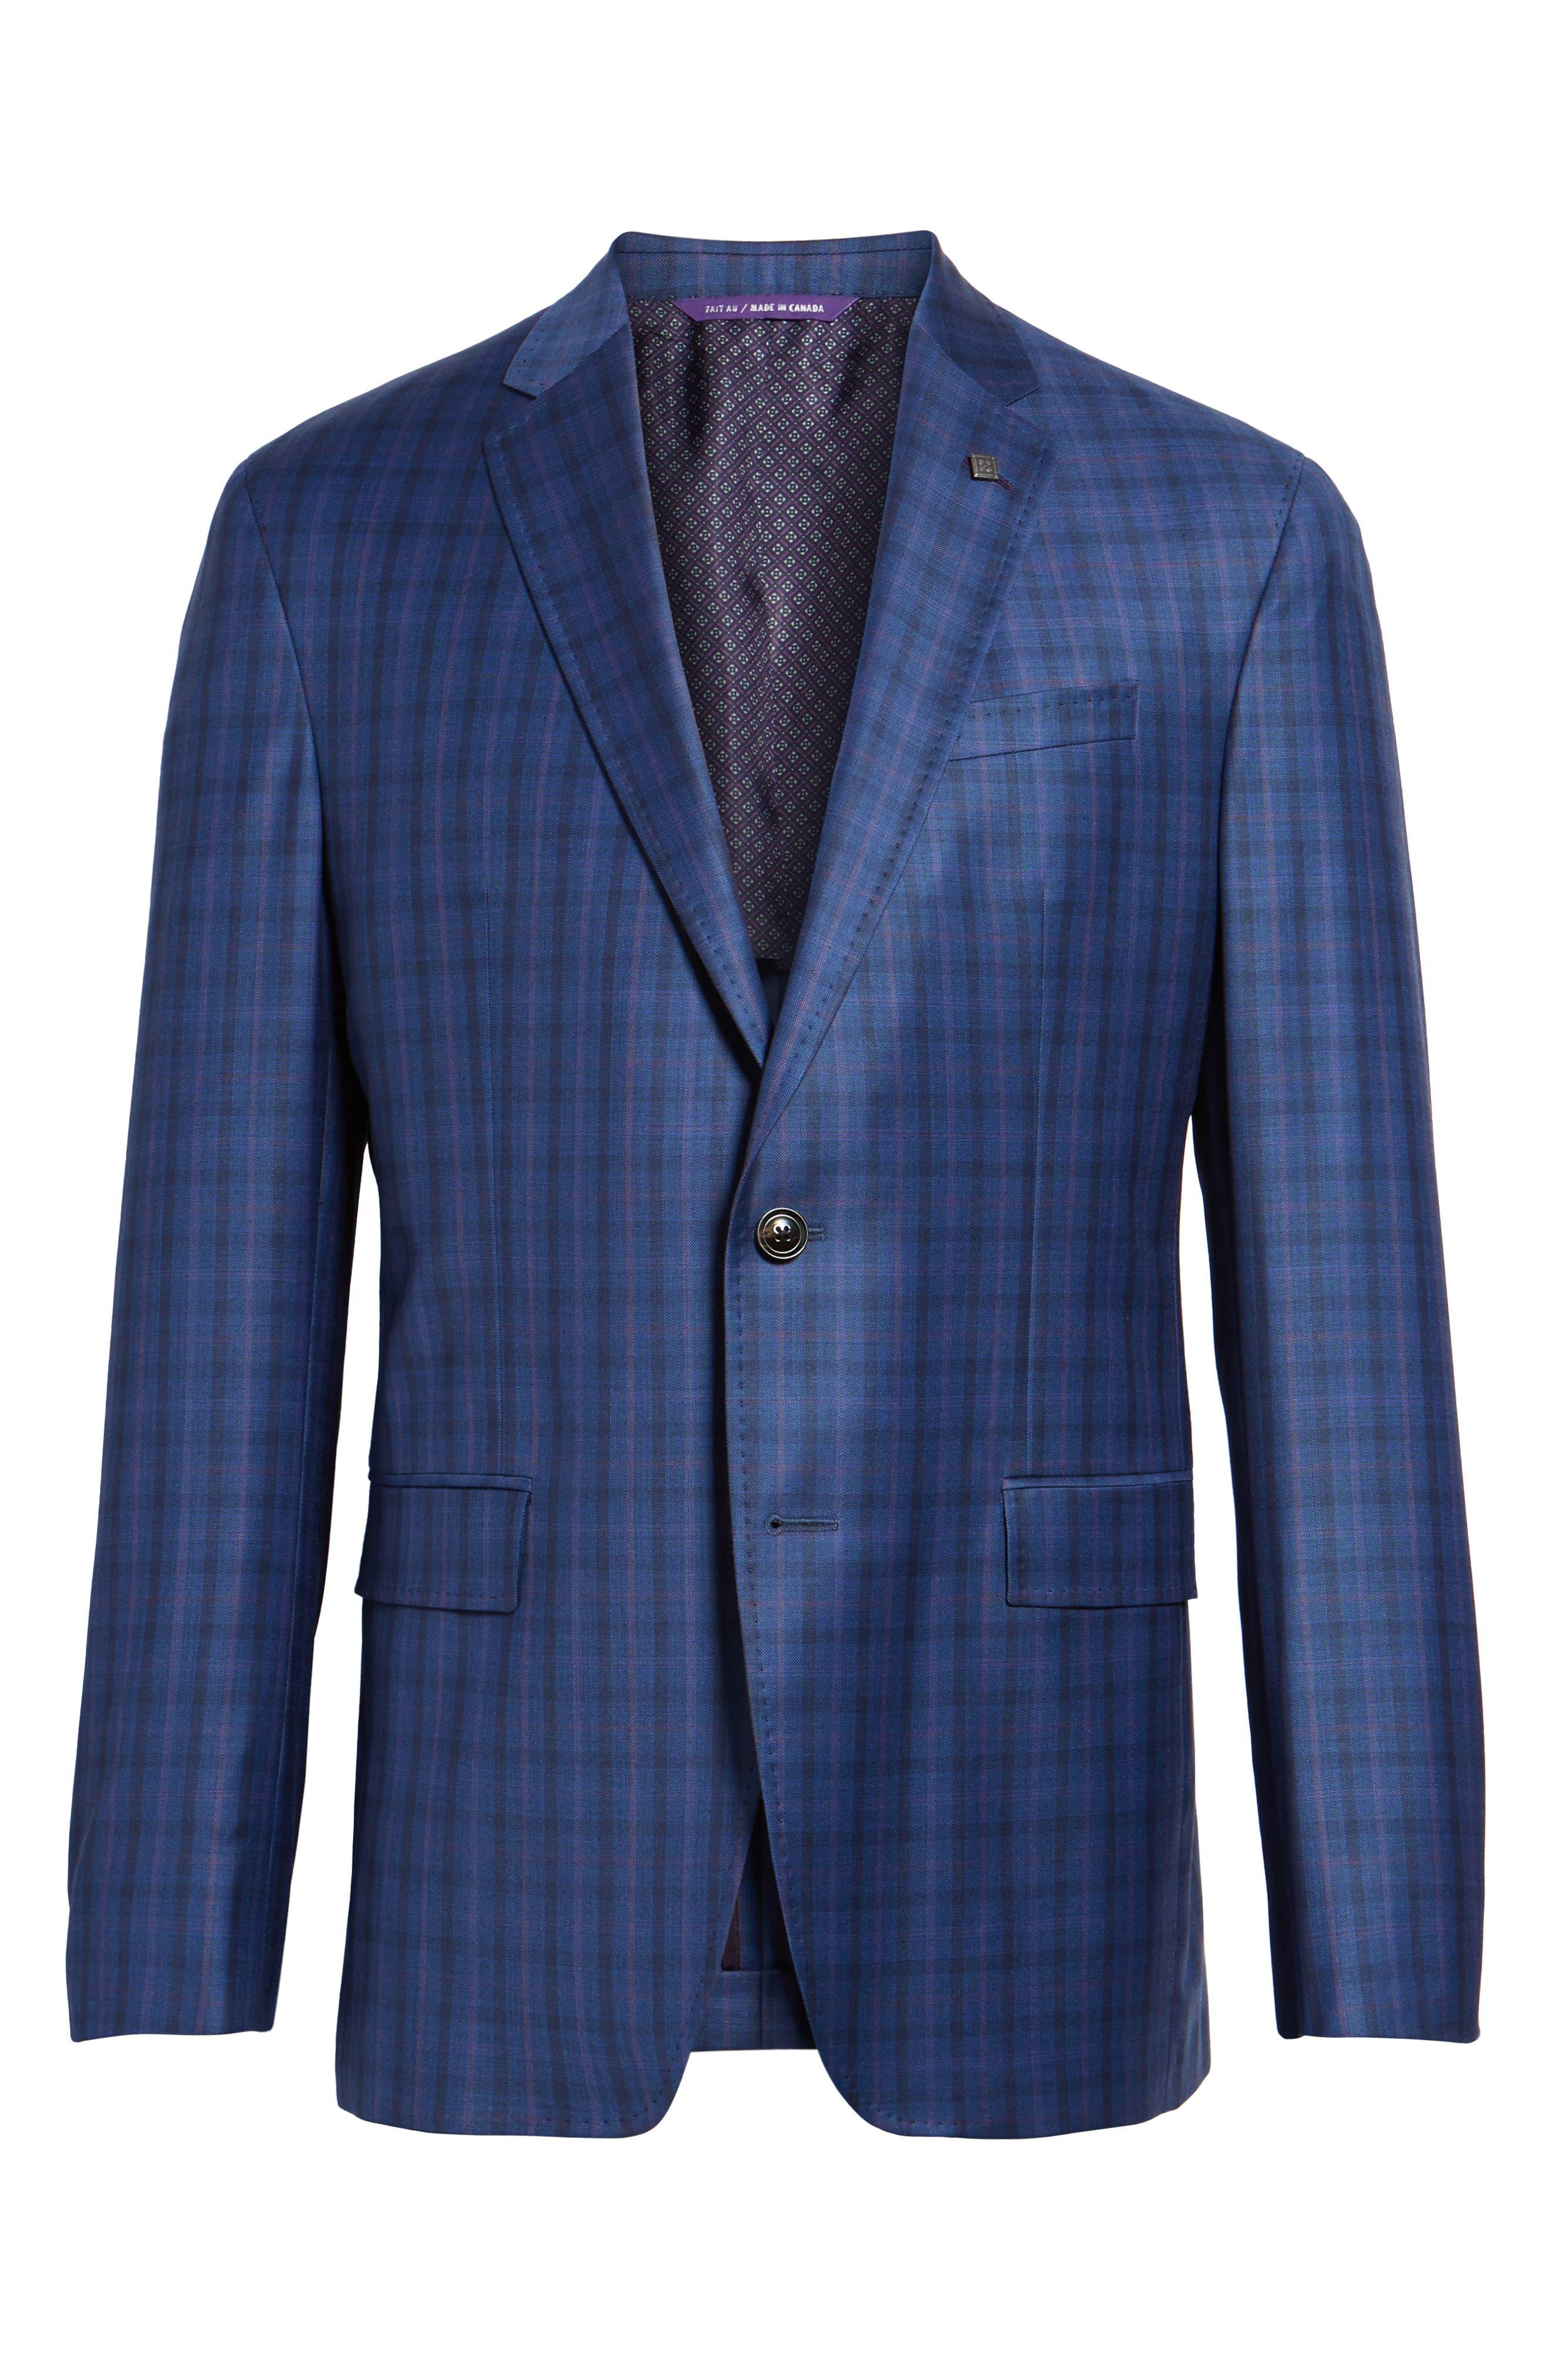 Konan Trim Fit Plaid Wool Sport Coat,                             Alternate thumbnail 6, color,                             Blue W/Light Berry Windowpane